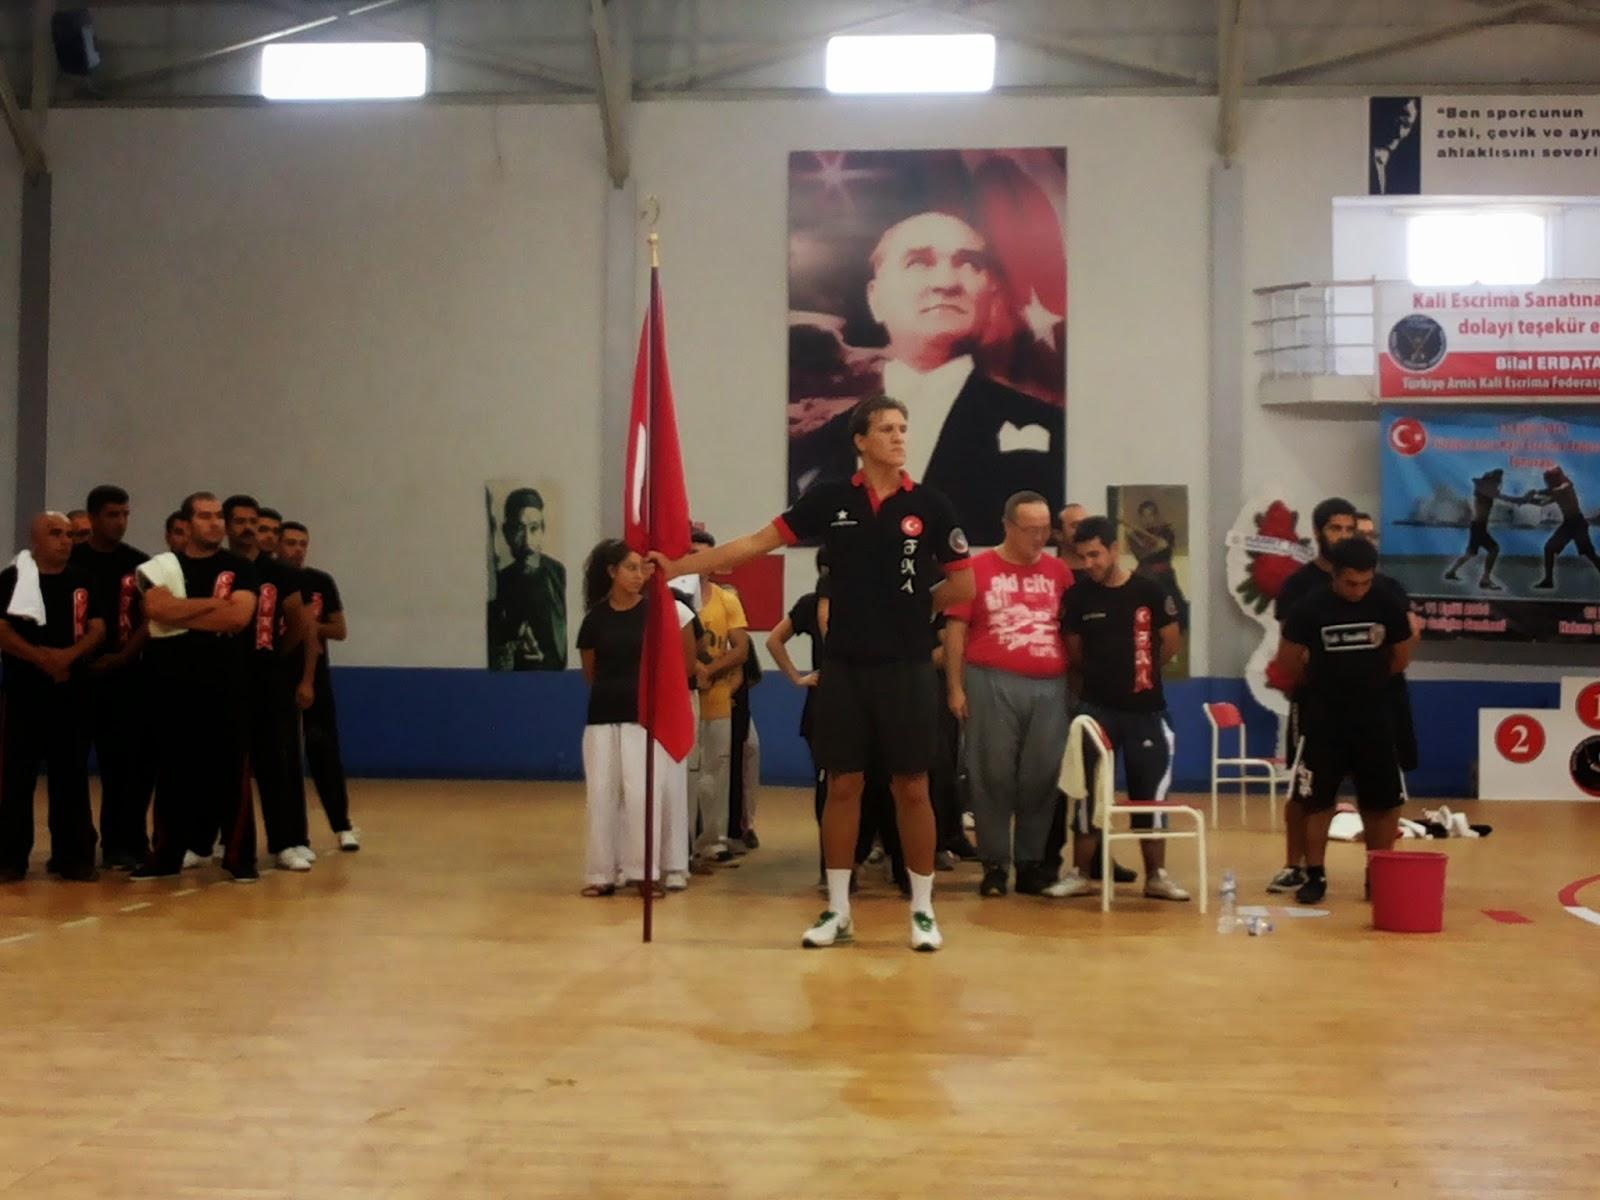 WSEF International Represents in Turkey with Master Guro Bilal Erbatan and Team